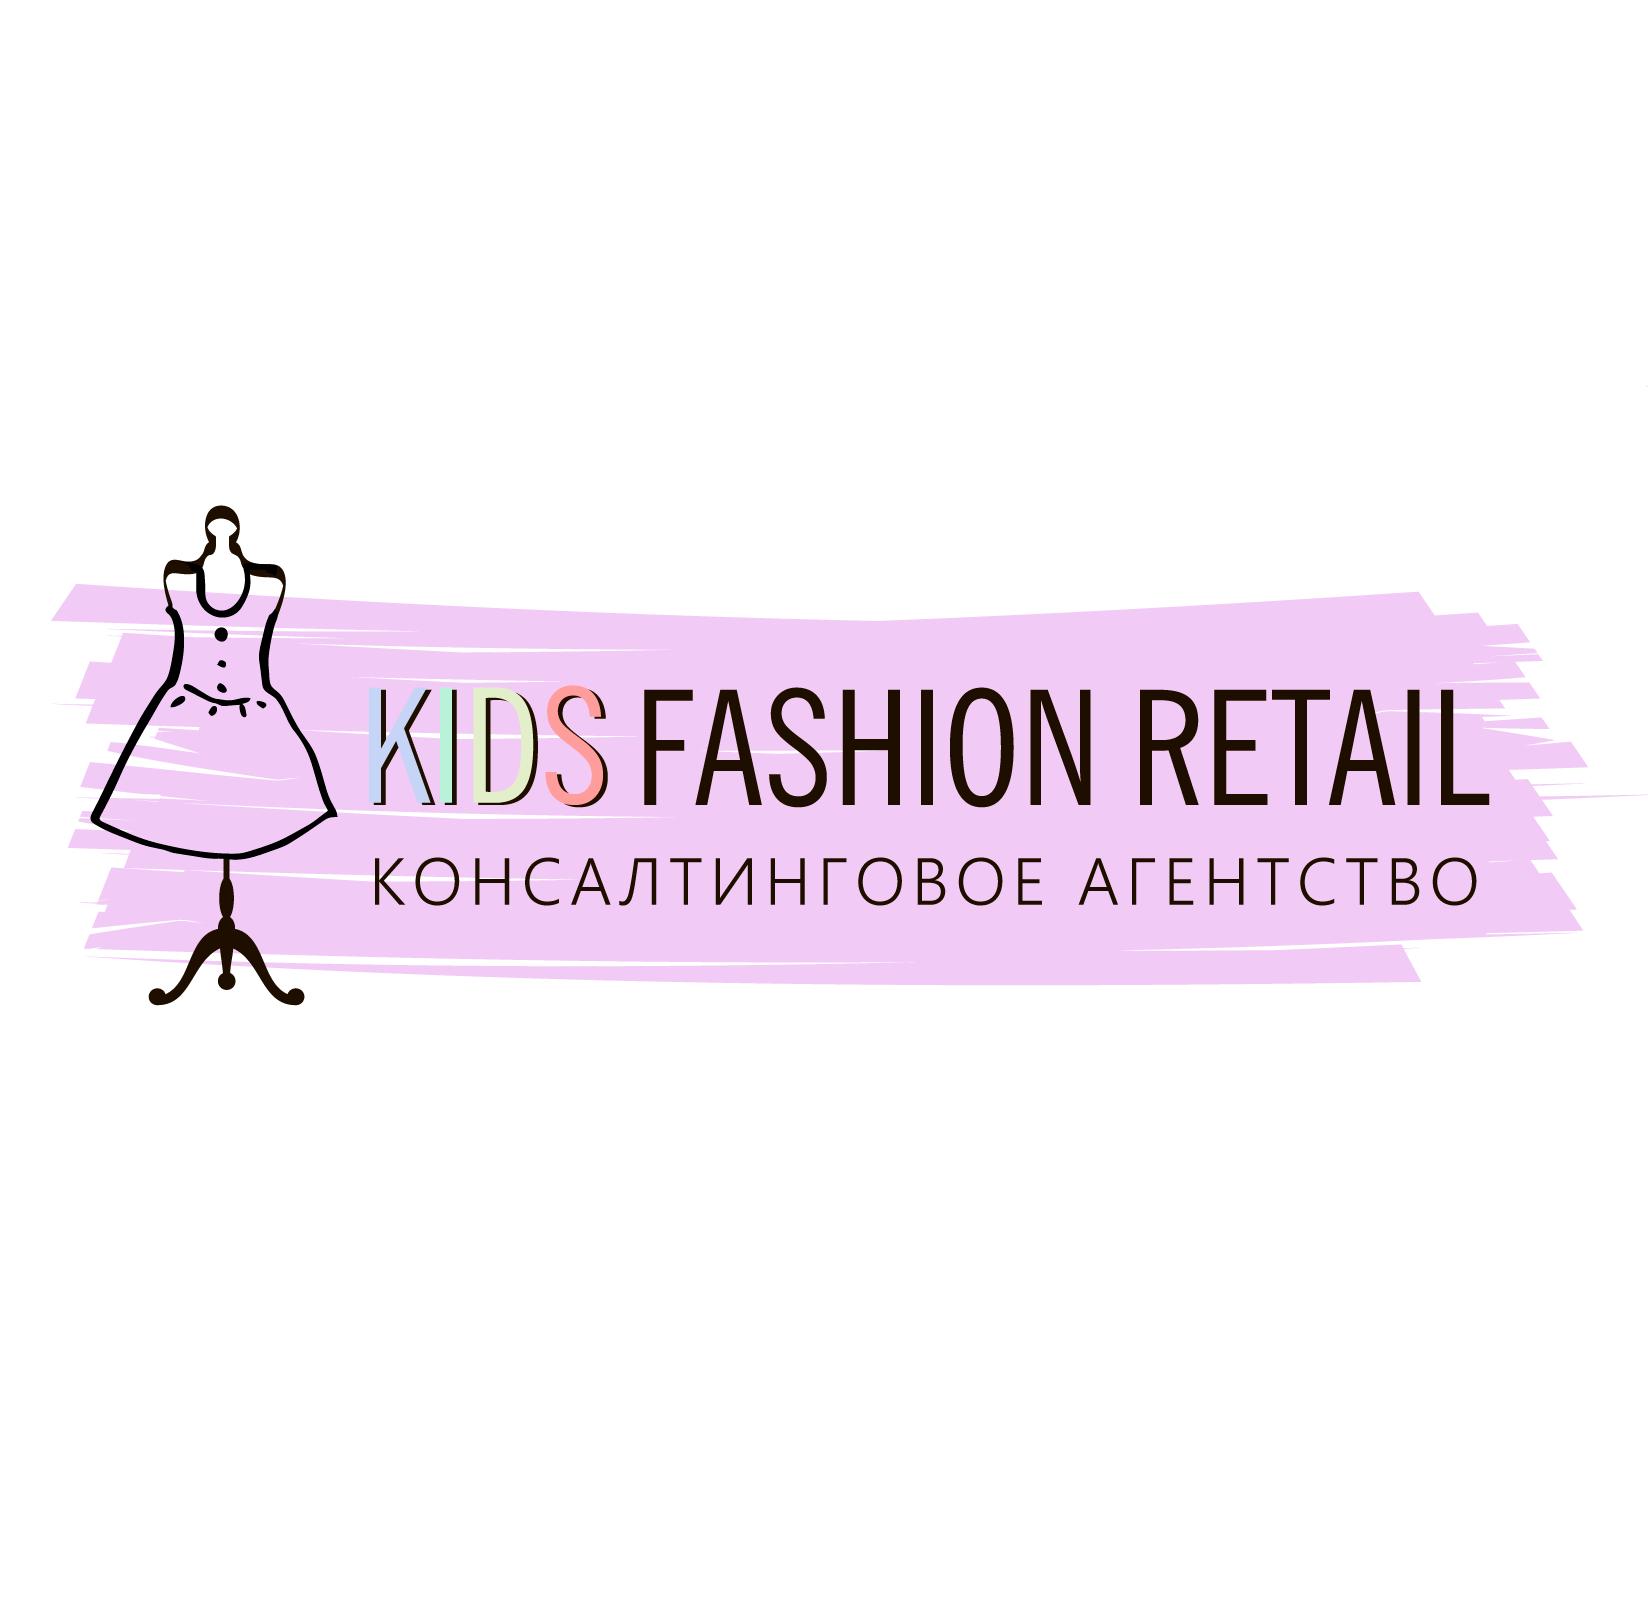 Kids Fashion Retail